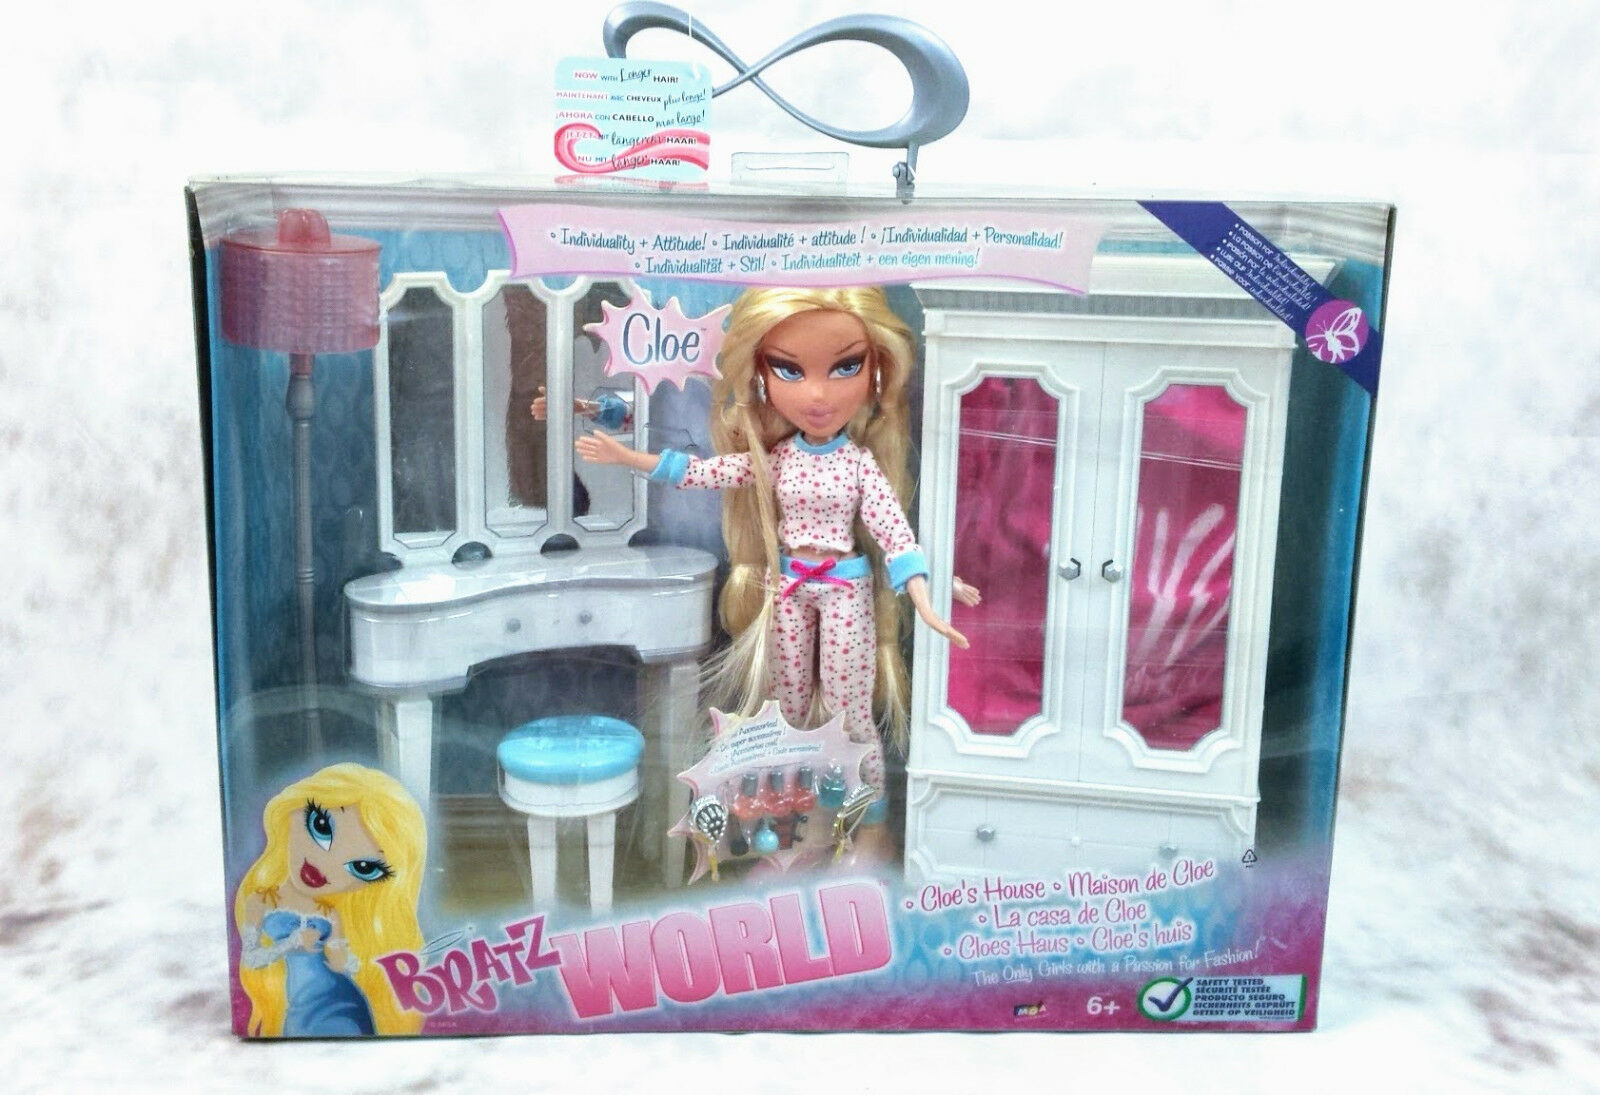 BRATZ WORLD CLOE´S HOUSE Doll and Bedroom furniture 2008 BNIB.